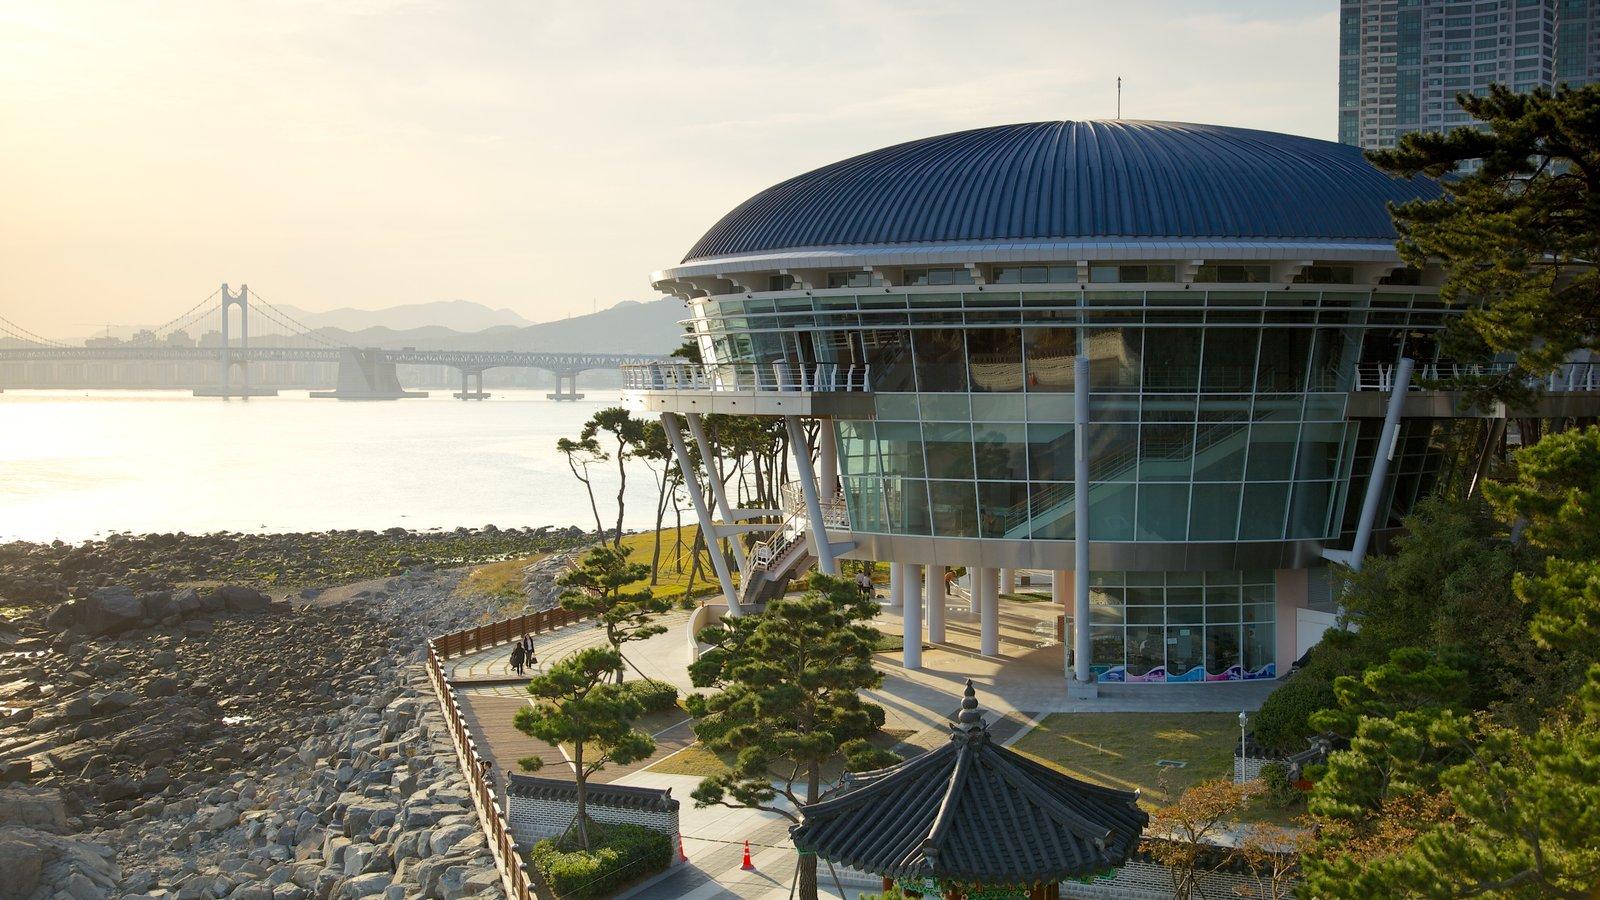 Fotos de arquitectura moderna ver im genes de corea del sur for Casa moderna corea